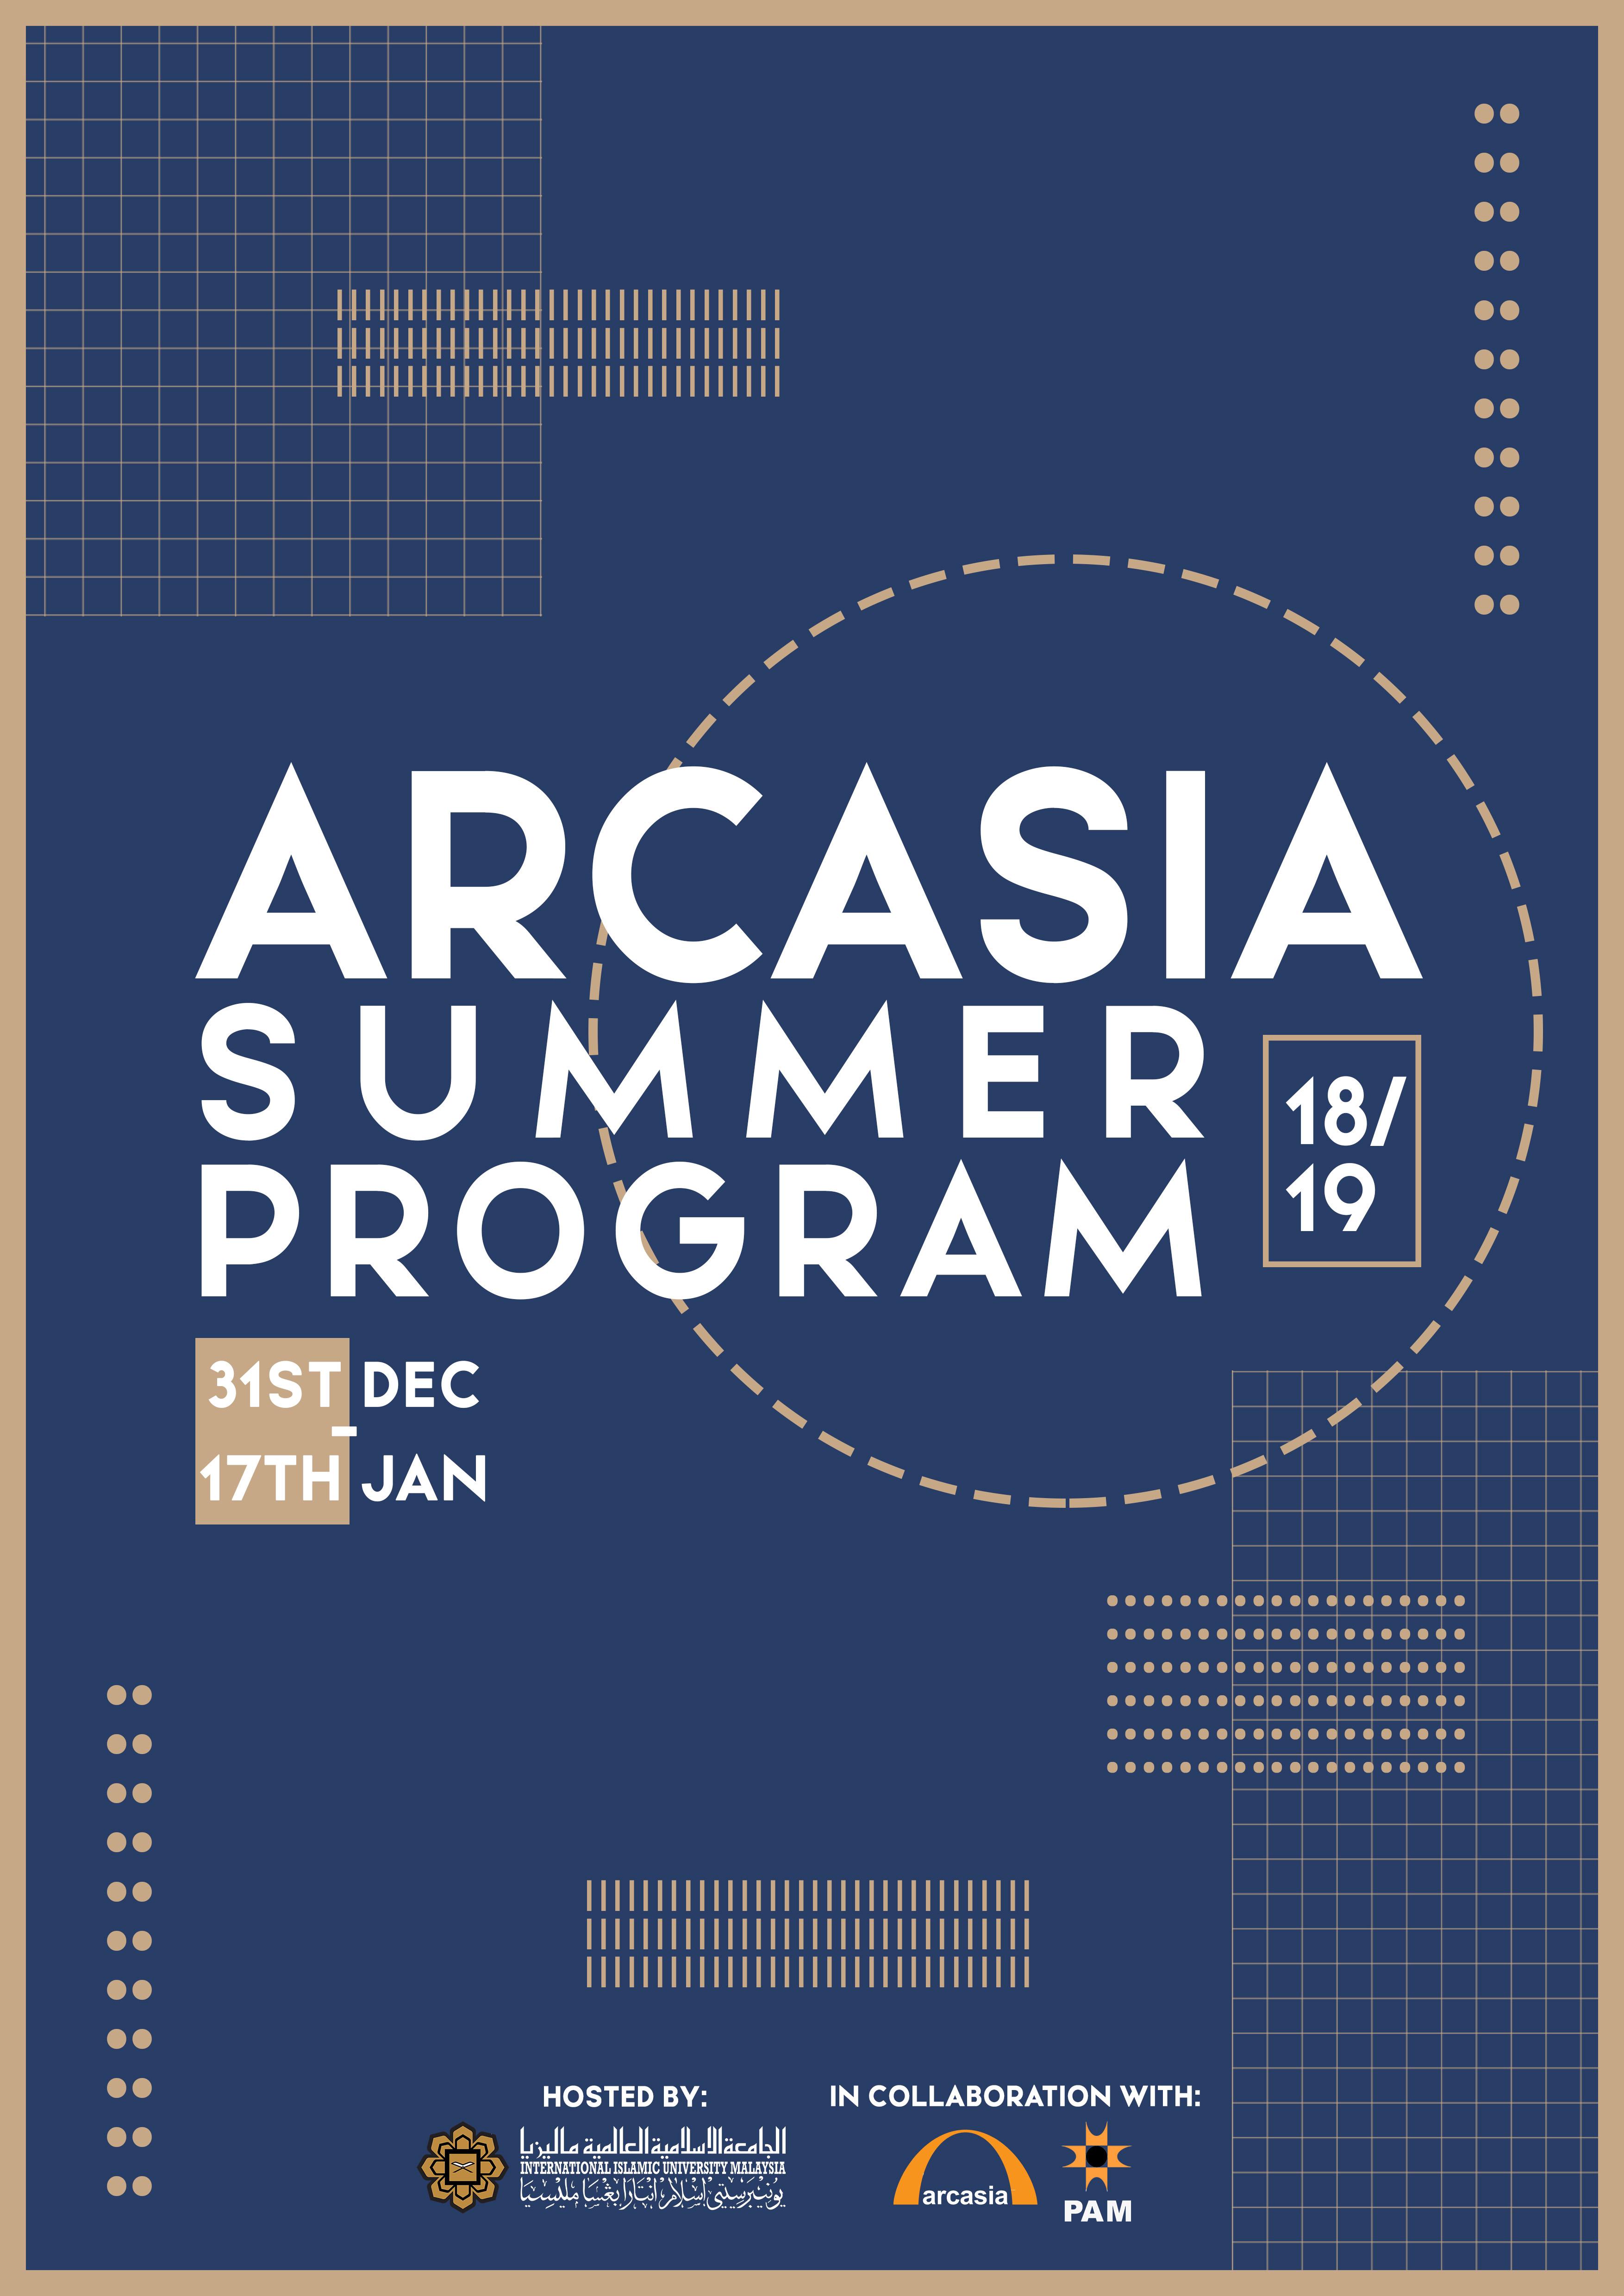 ARCASIA Summer Program 18/19